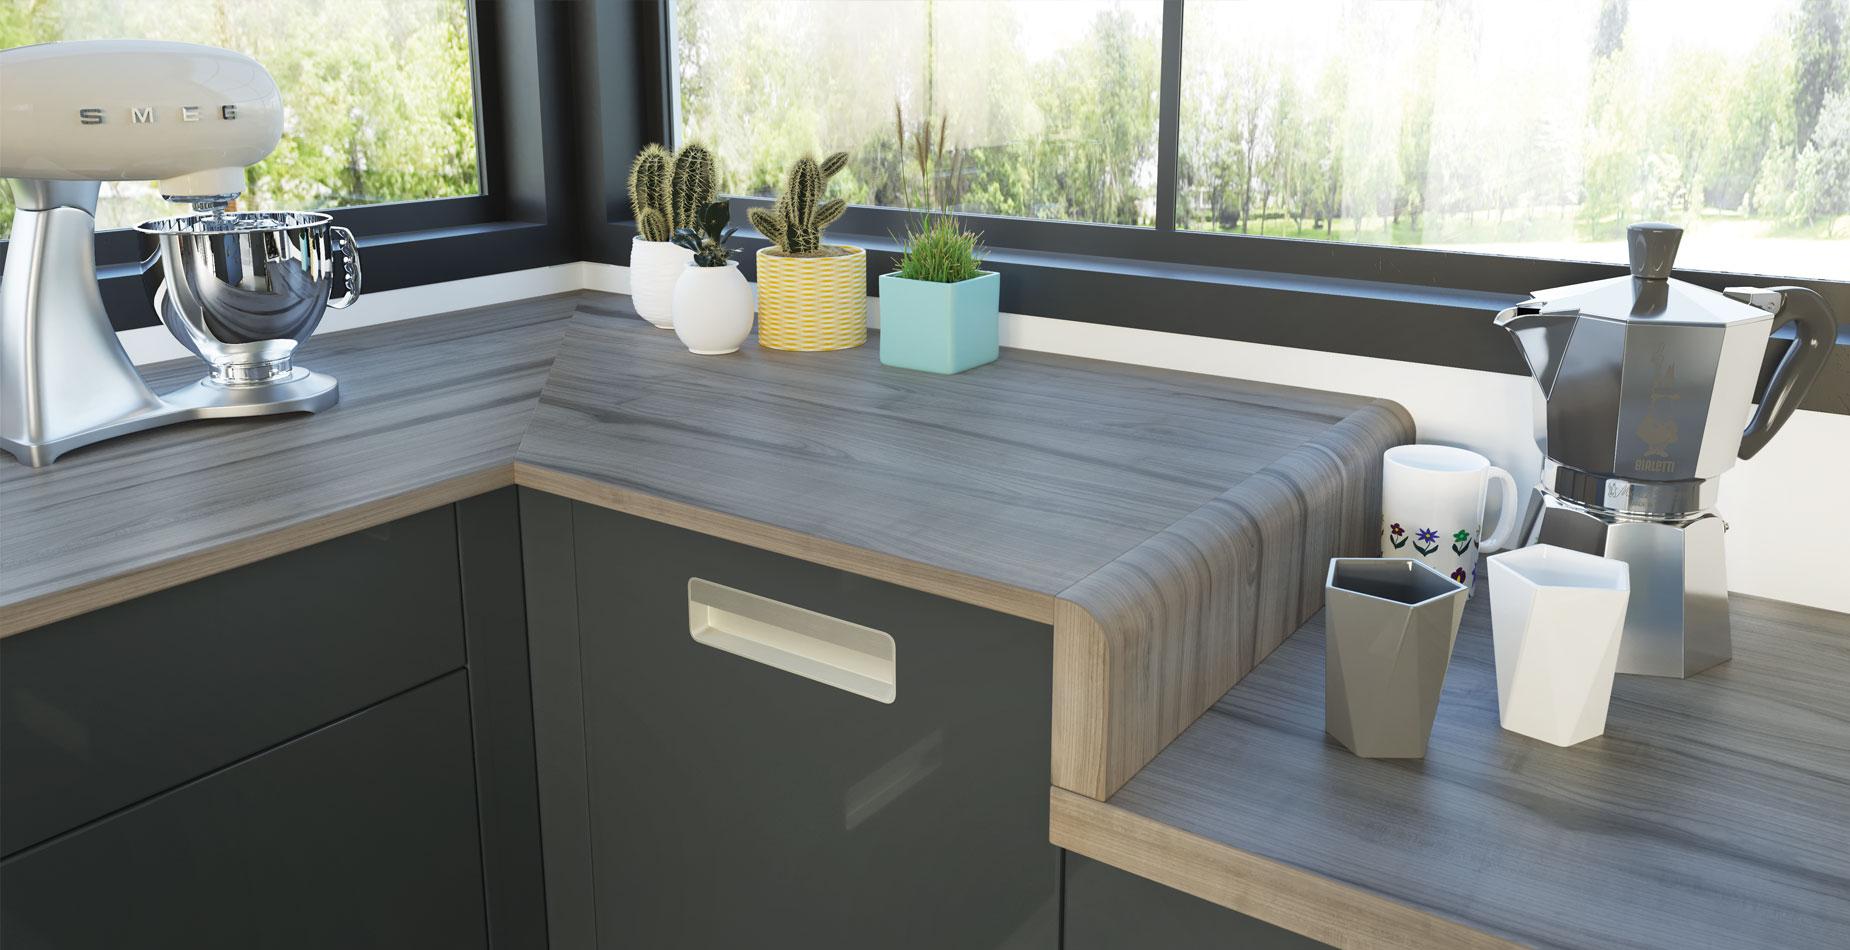 le concept cuisine bebop comera cuisines. Black Bedroom Furniture Sets. Home Design Ideas